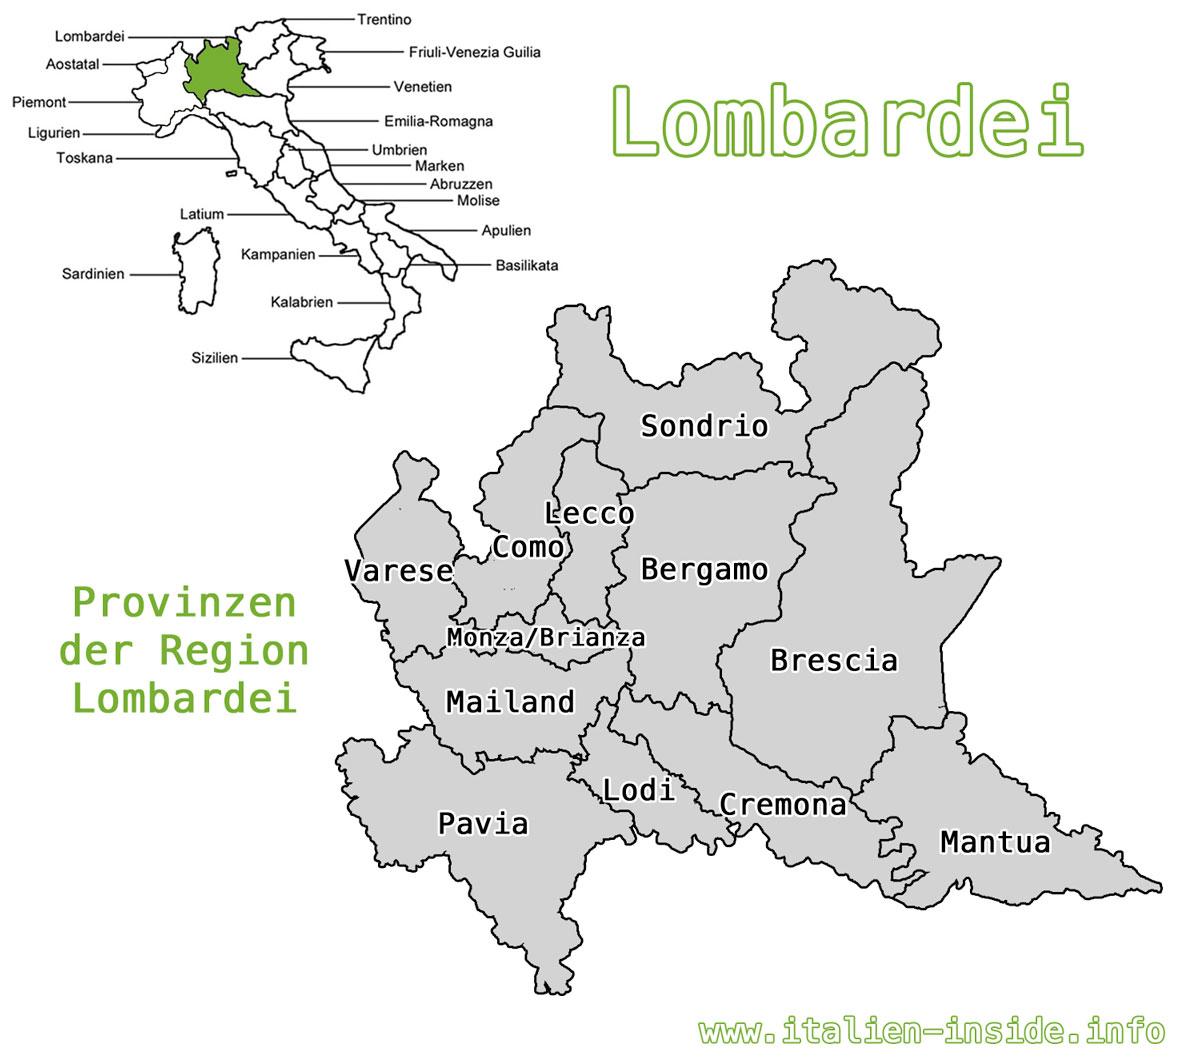 Karte-Lombardei-Lage-Provinzen